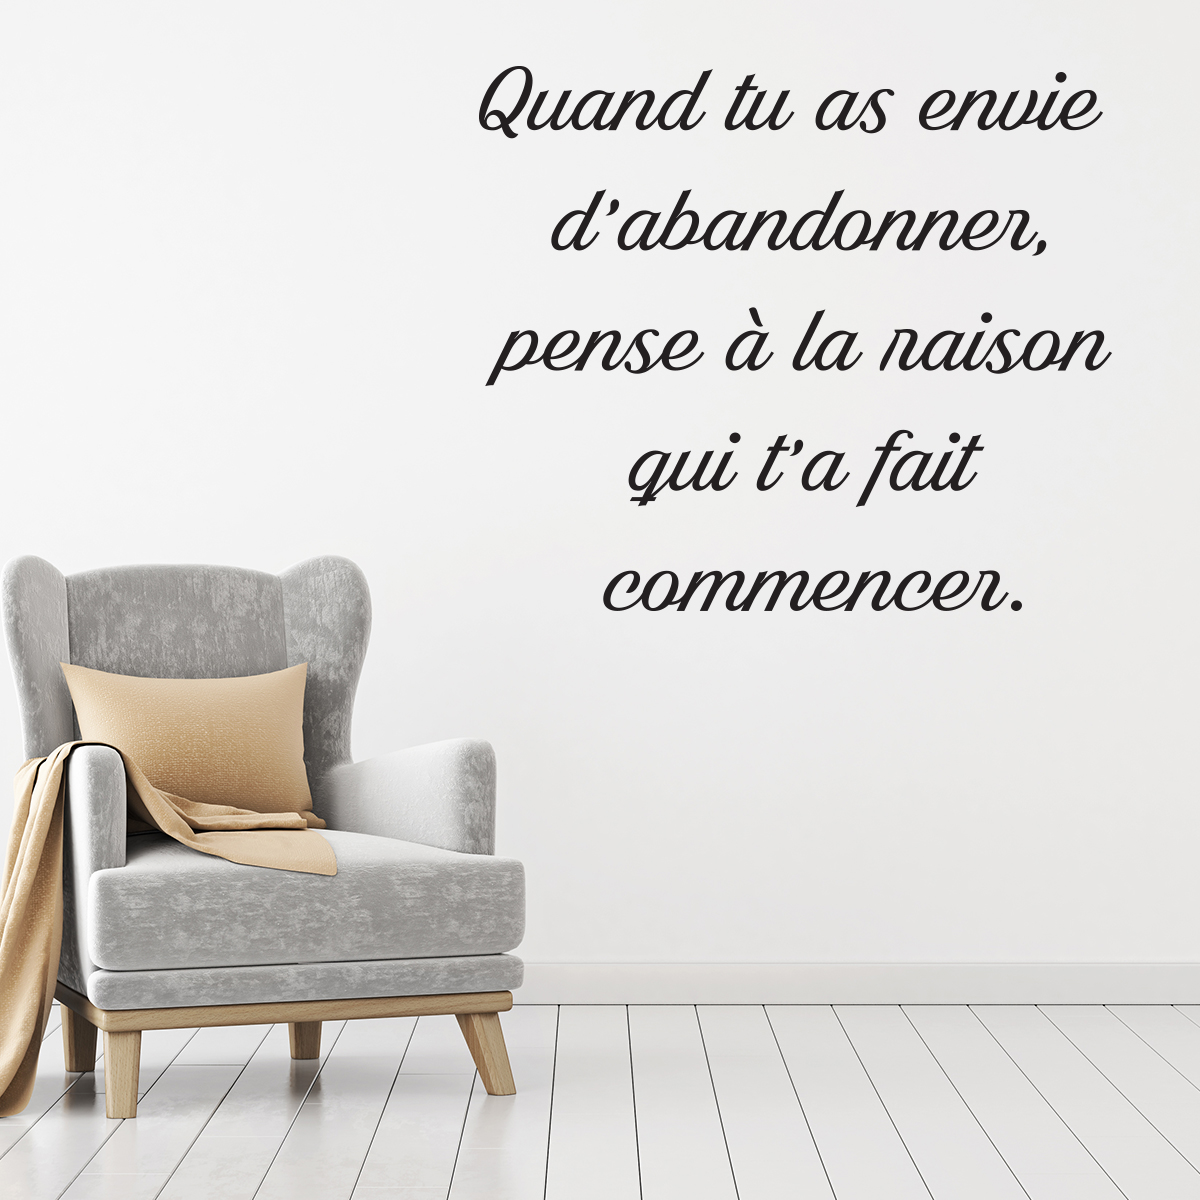 stickers muraux citations phrases citation u stickers. Black Bedroom Furniture Sets. Home Design Ideas